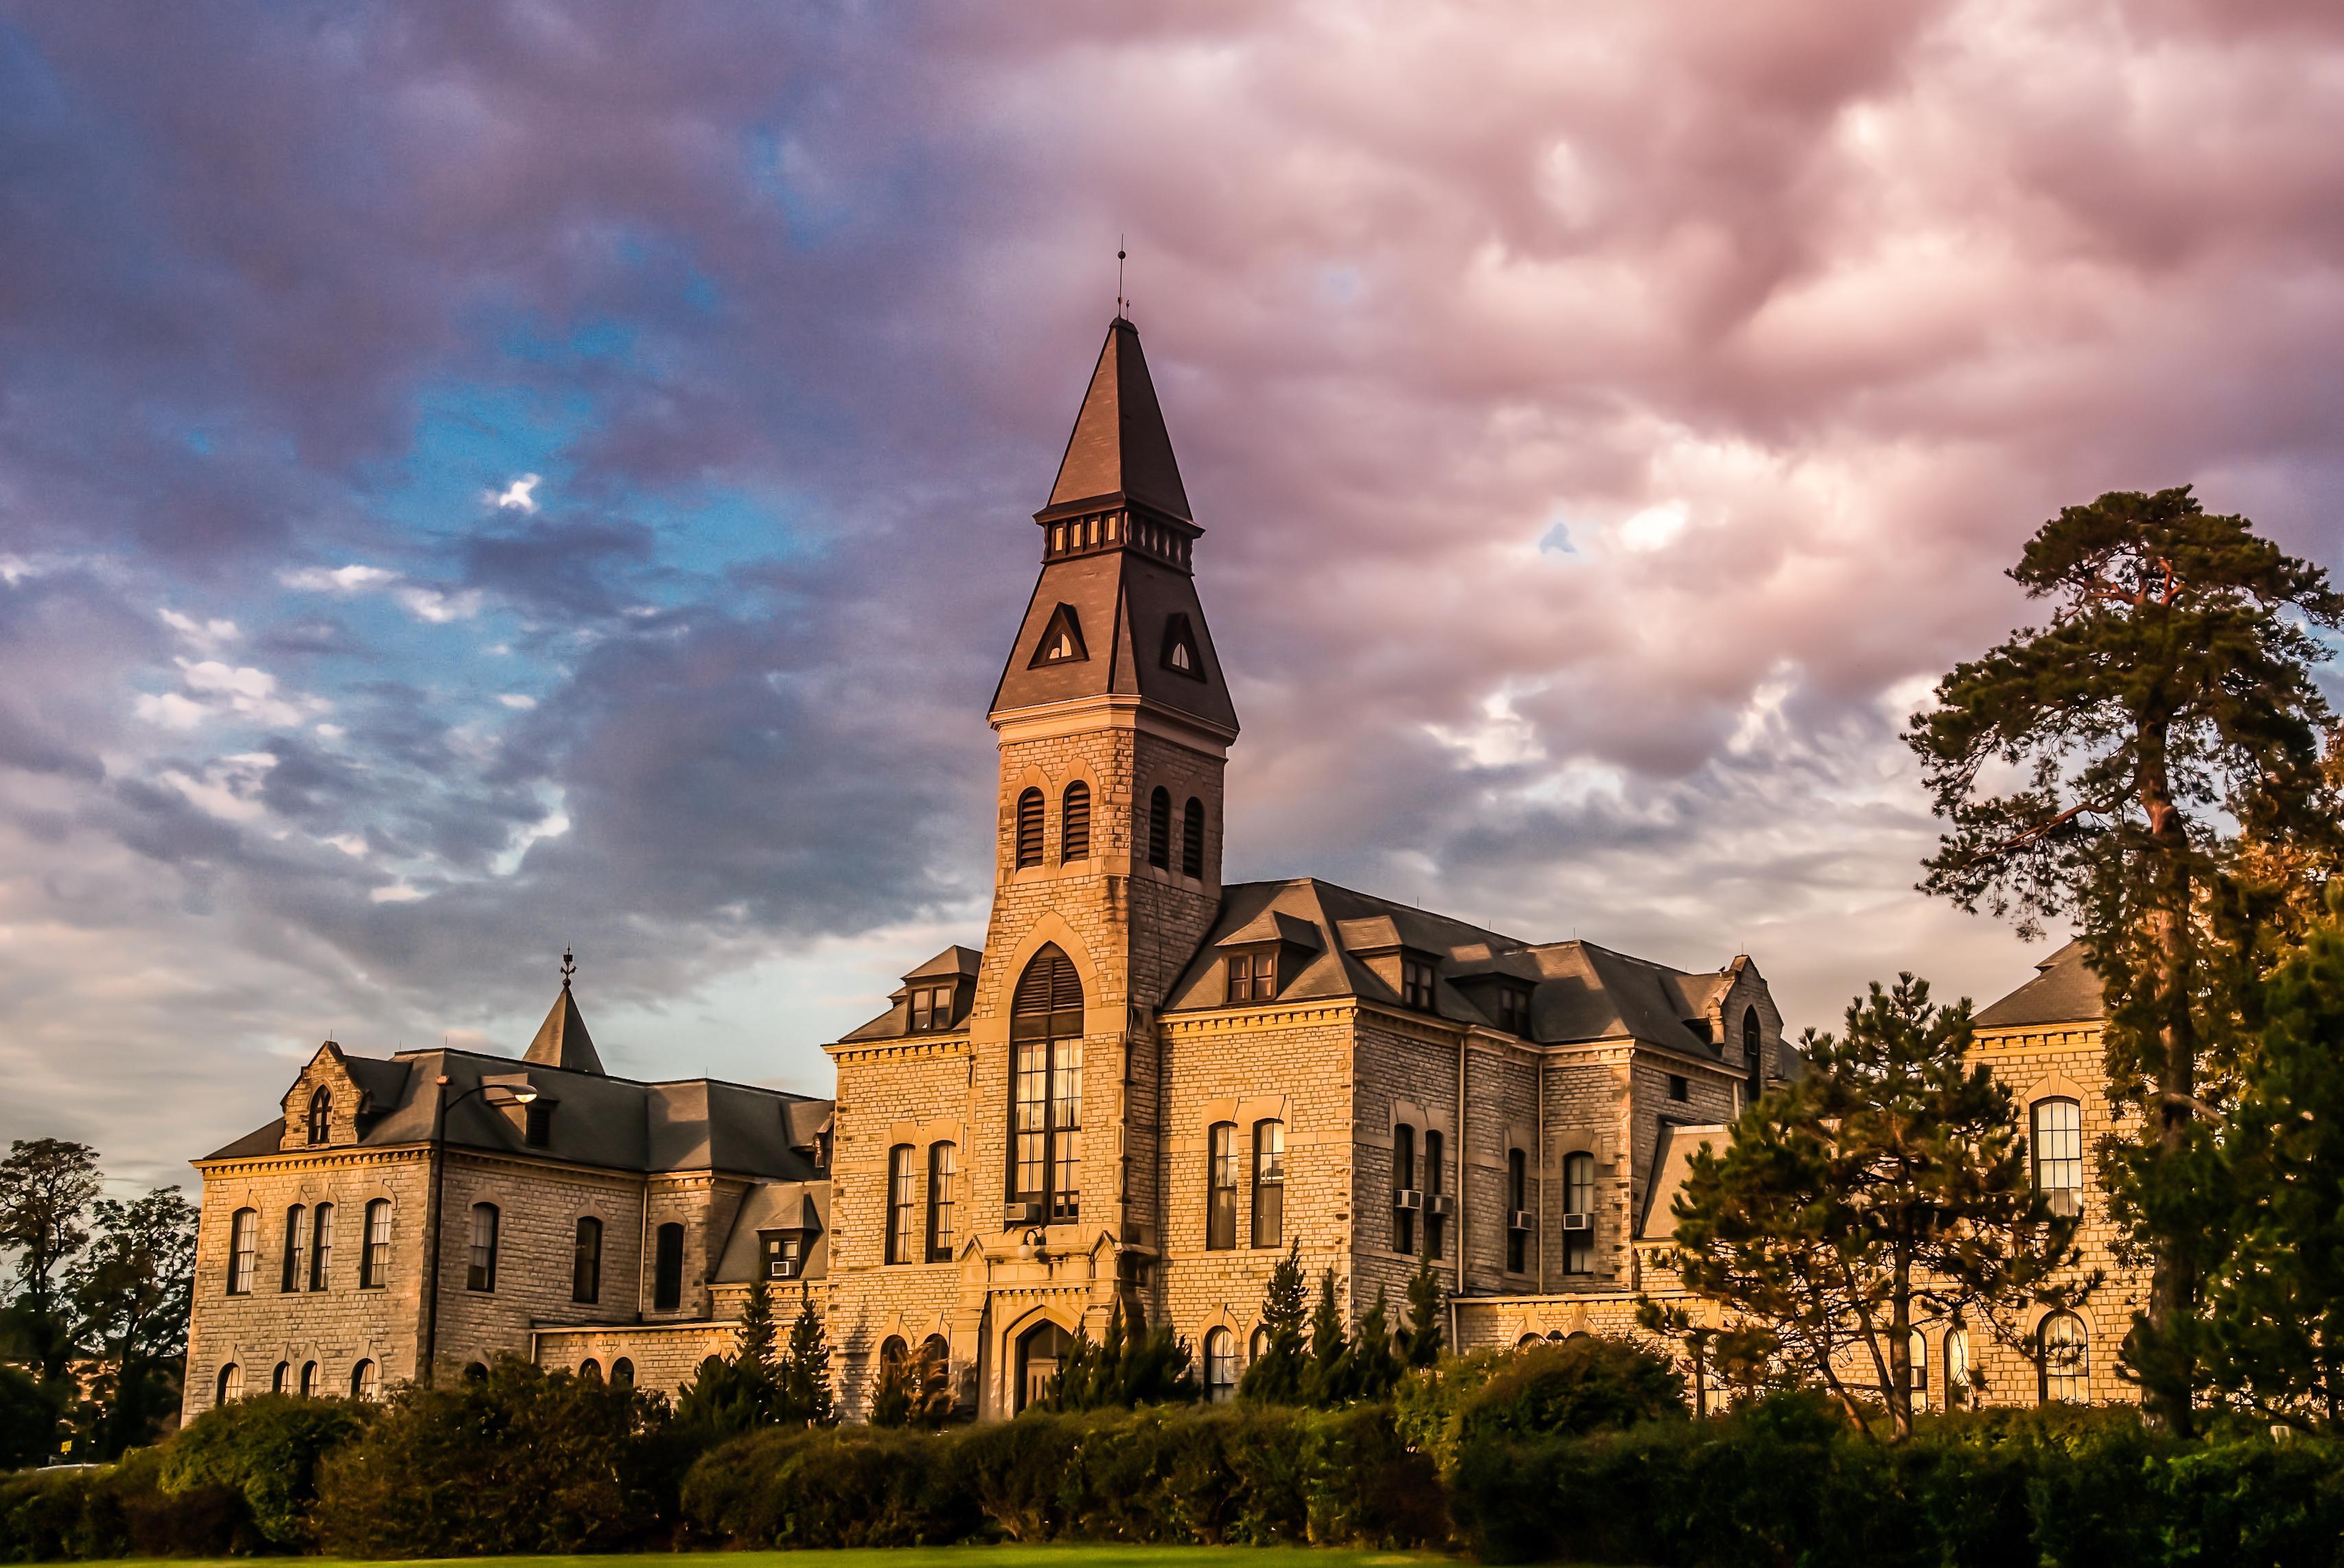 Kansas State University >> Stock Photo And Video Media Guide K State News Kansas